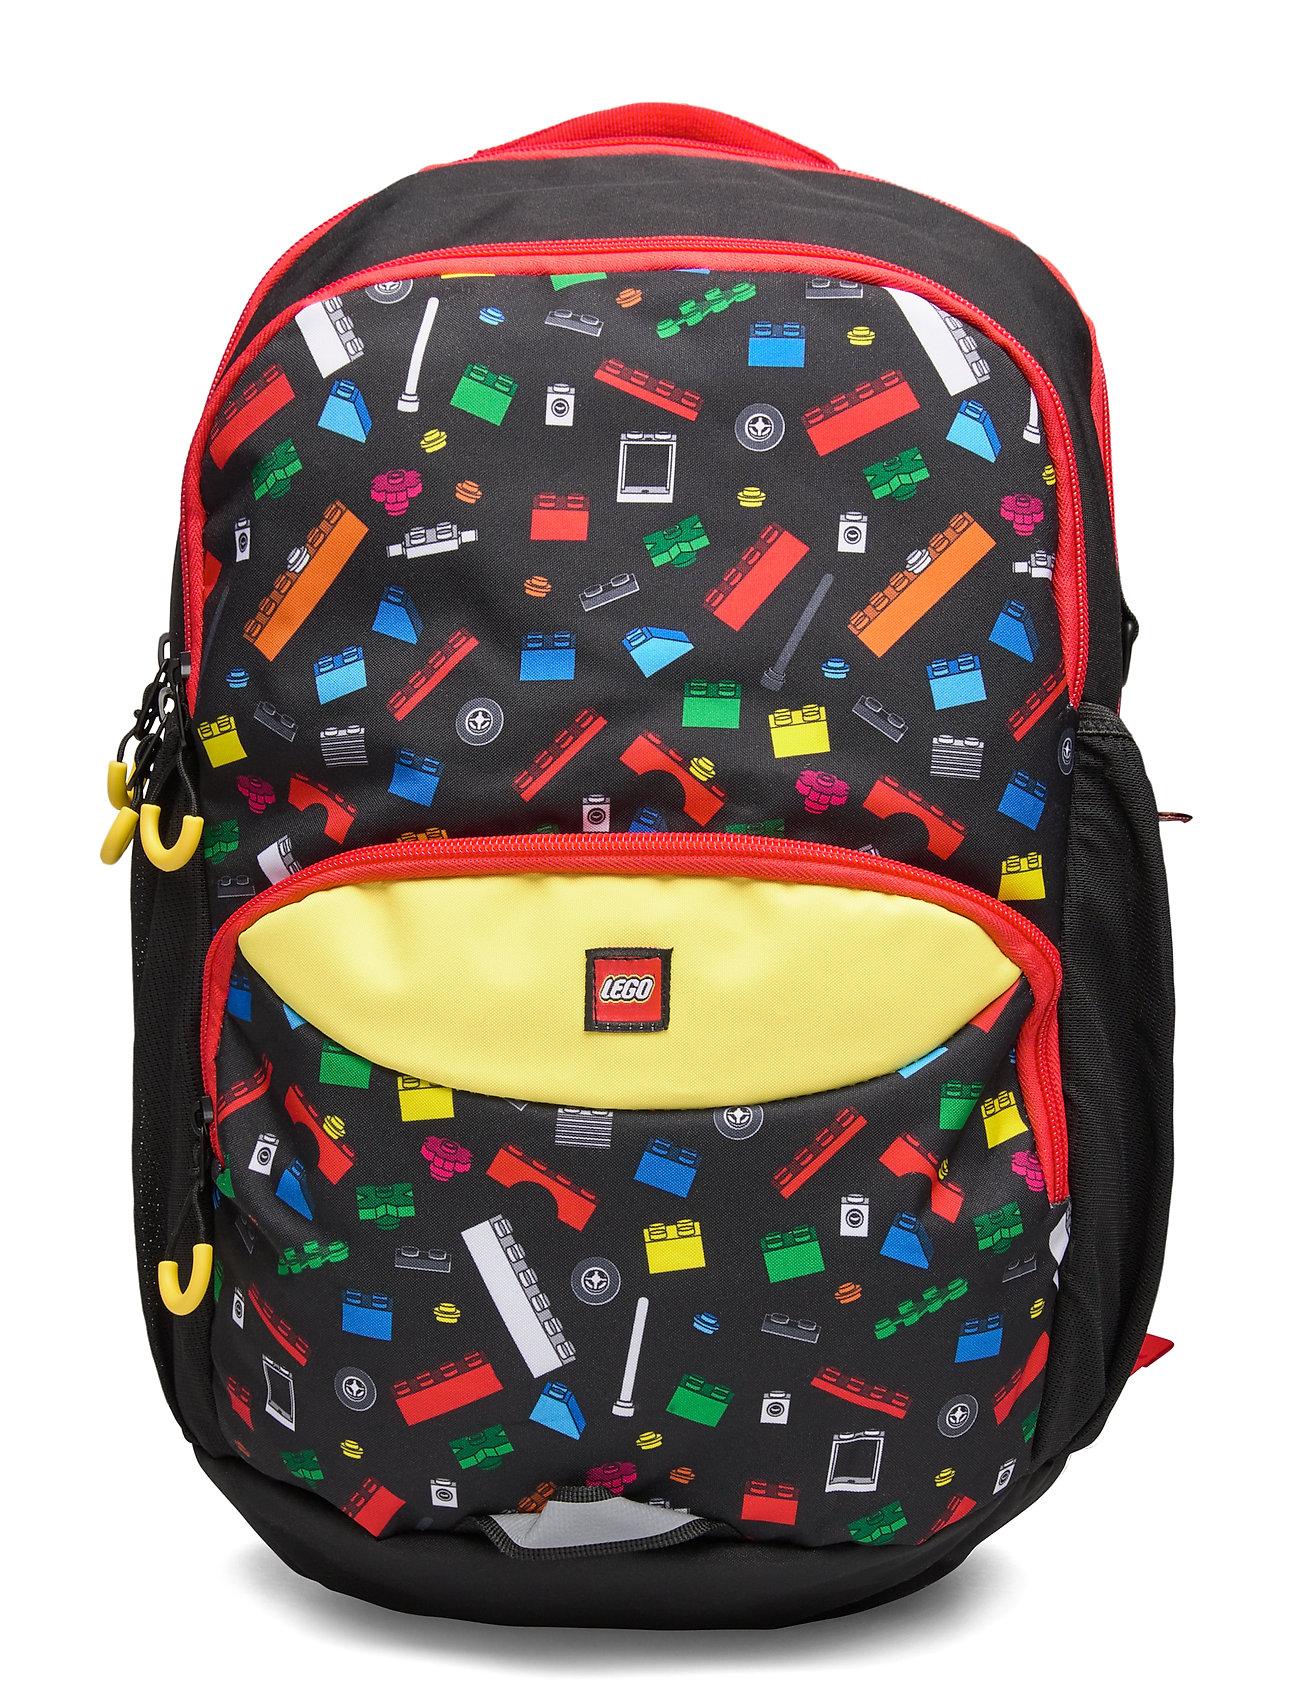 Lego Bags FREY Backpack Advanced - BRICKS FREY